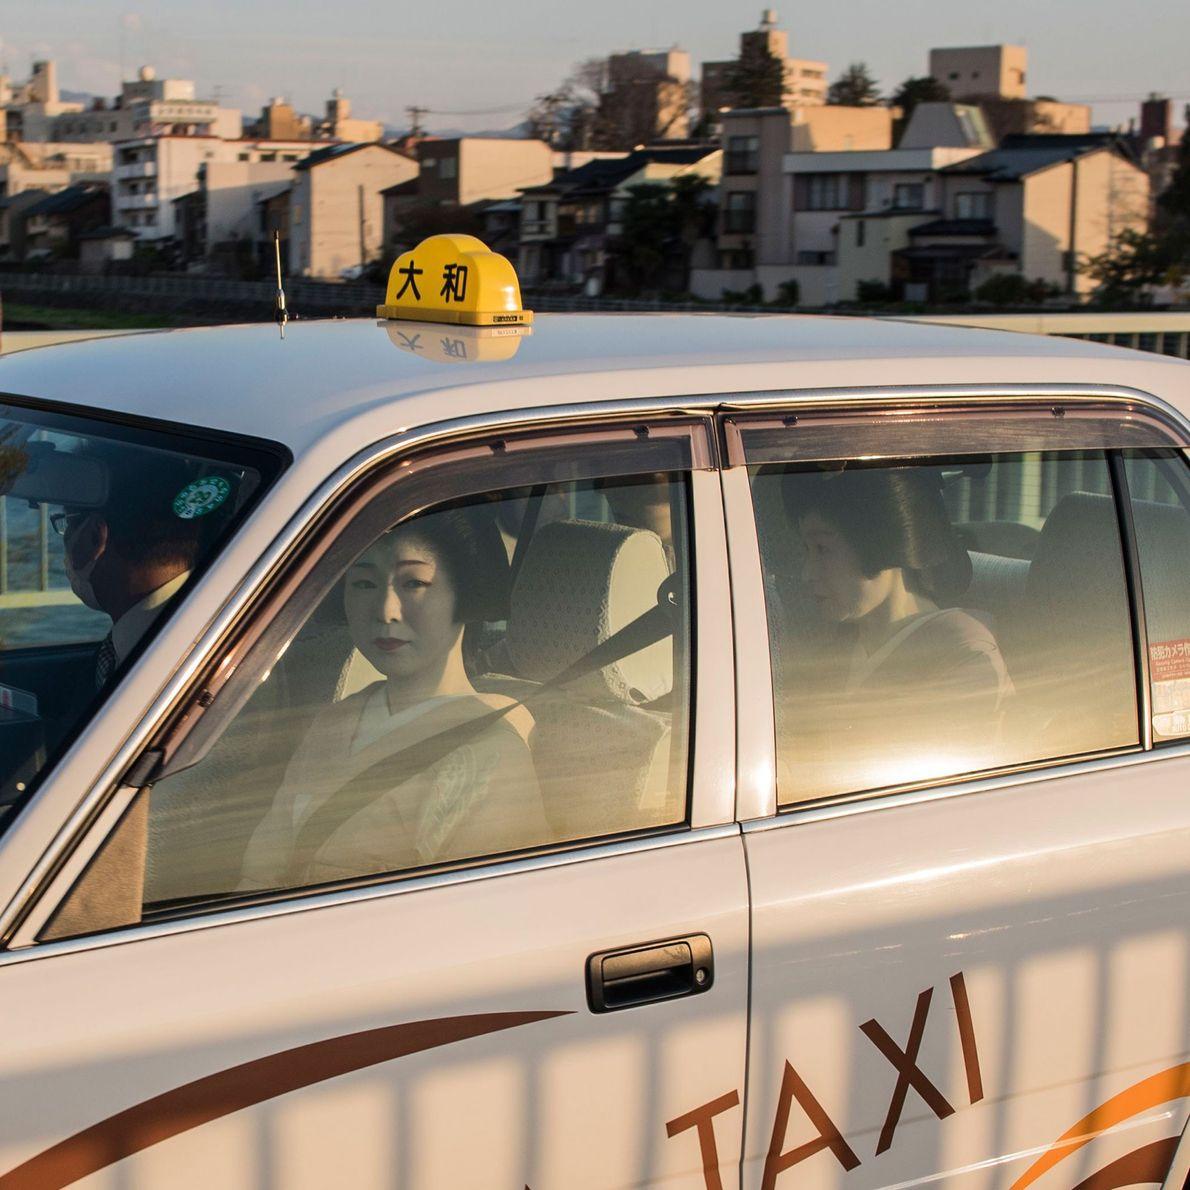 Kanazawa-shi, Ishikawa, Japan  The geisha districts of Kanazawa are hundreds of years old. Taxis have a shorter ...